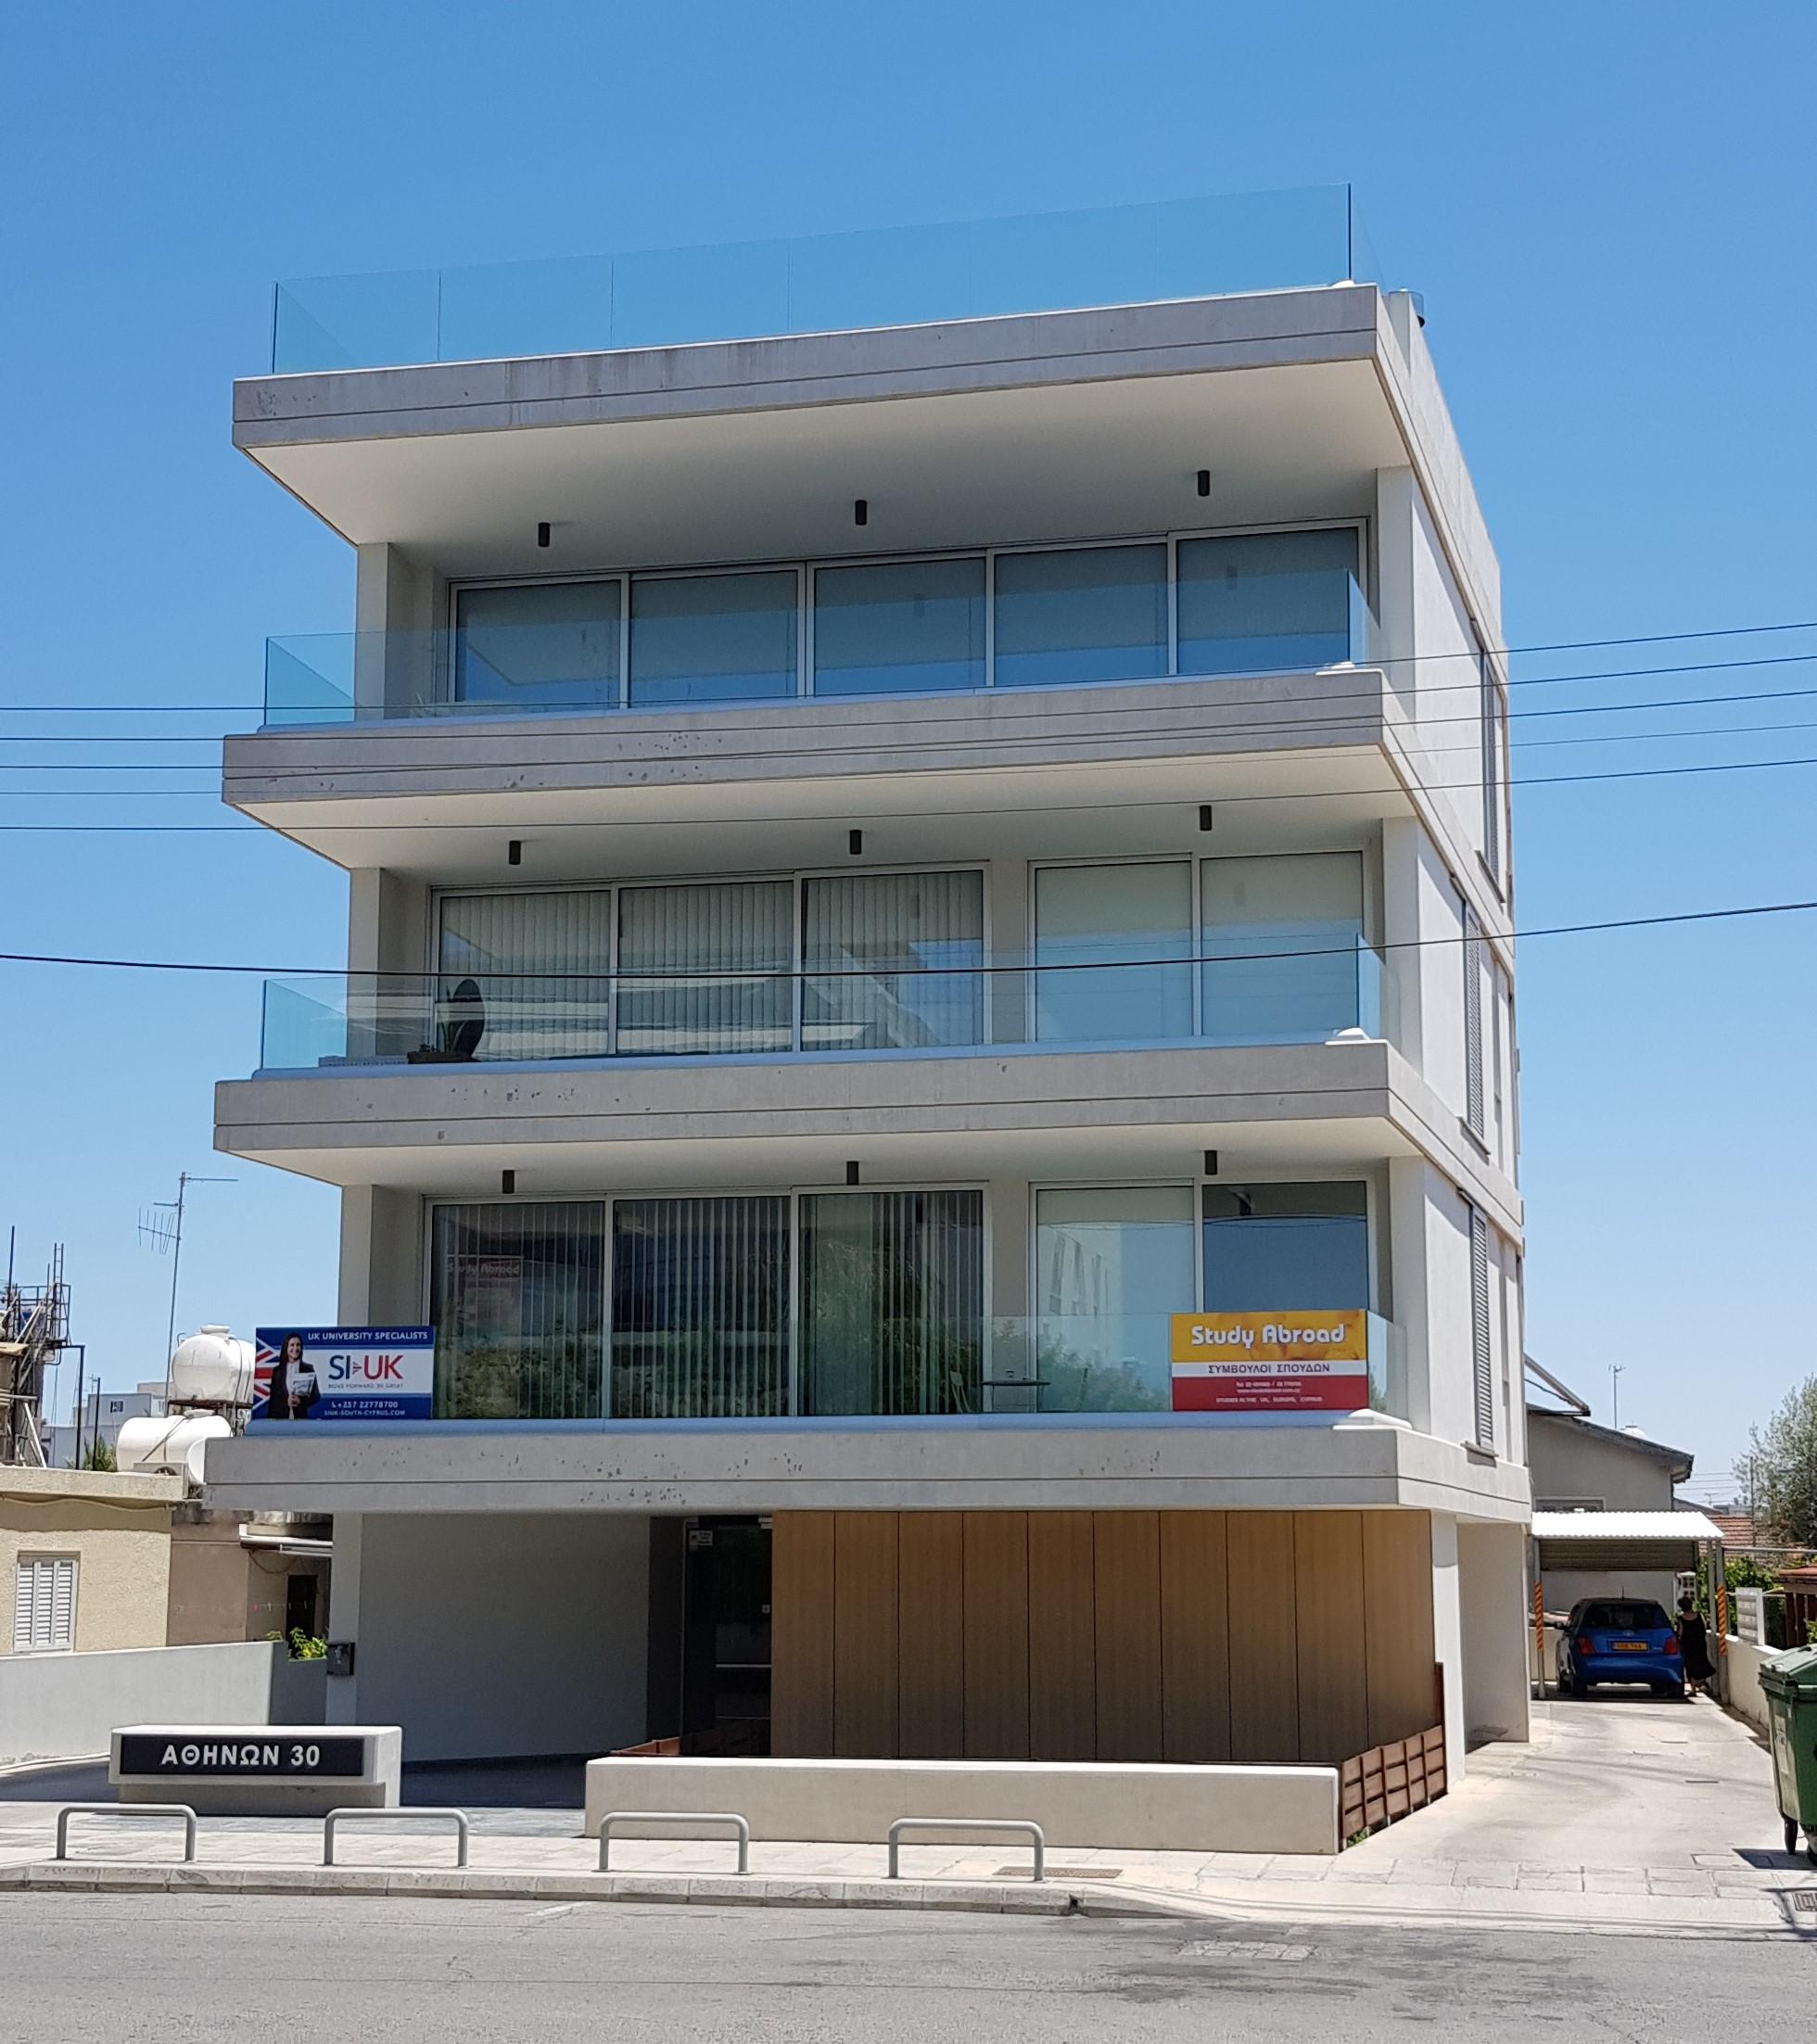 5 city apartments in the capital very near Nicosia city center